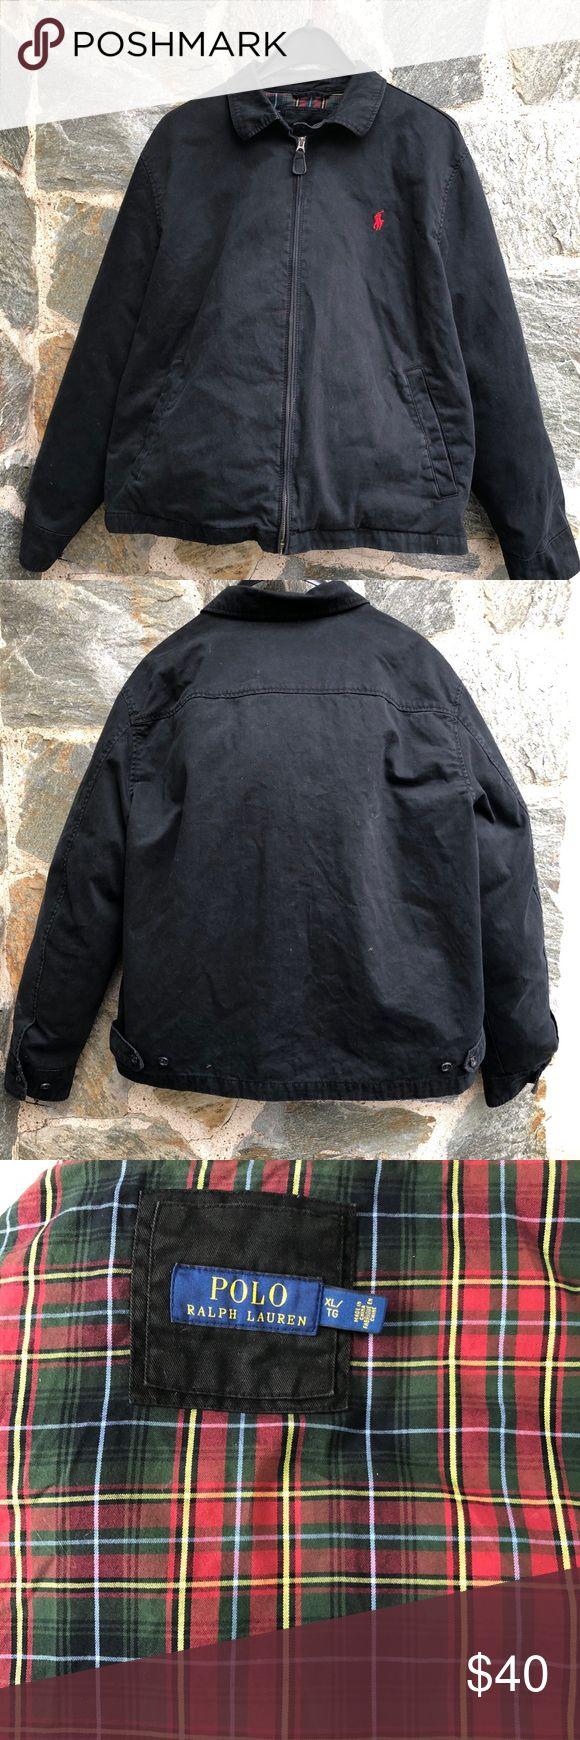 Vintage Men's Polo Jacket XL Black classic men's Polo jacket size XL.  Excellent condition. Polo by Ralph Lauren Jackets & Coats Windbreakers